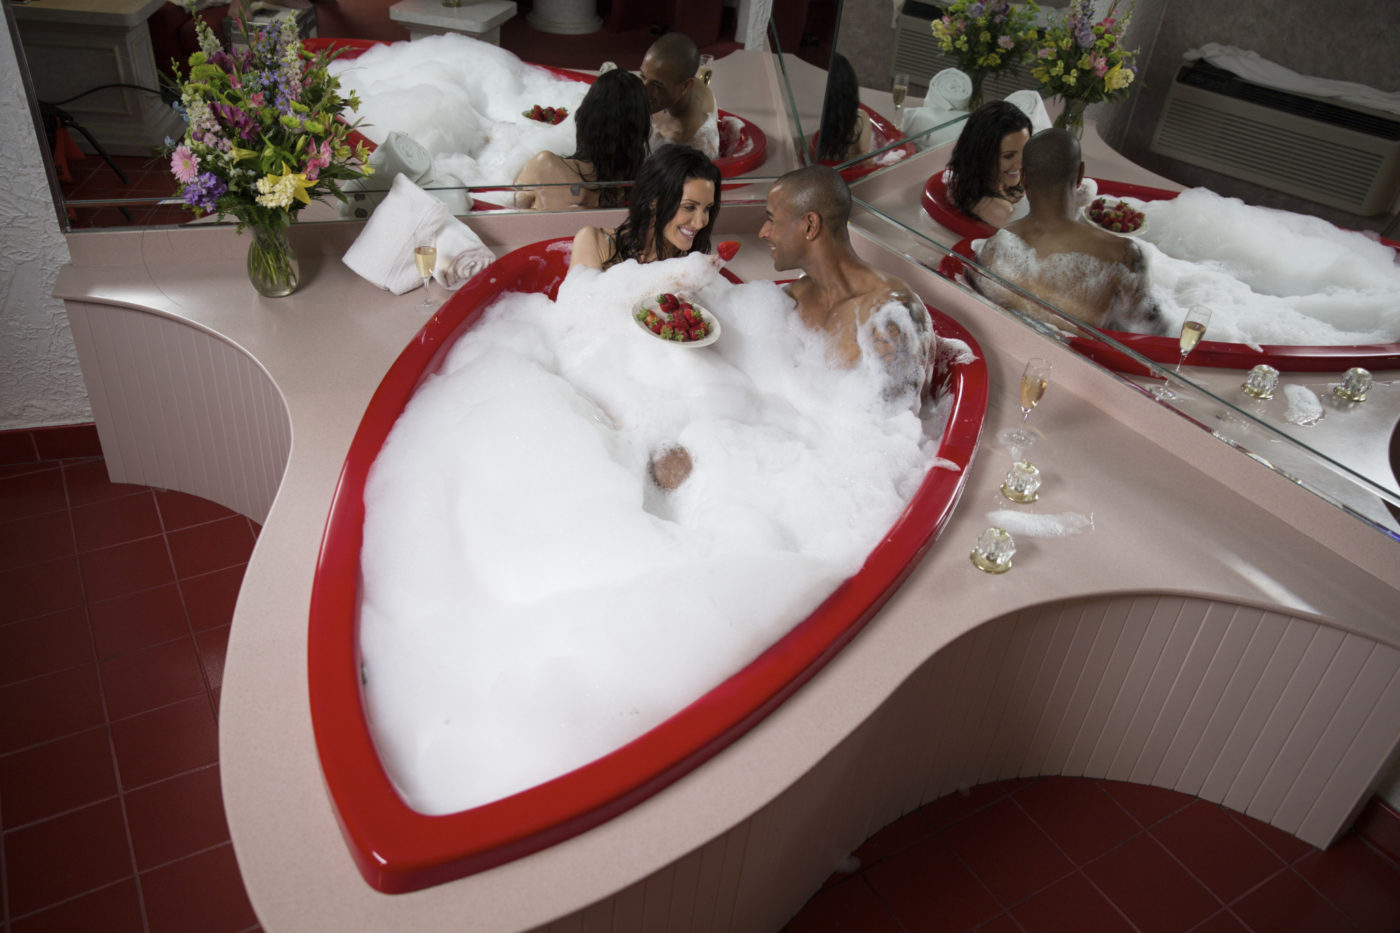 heart-shaped tubs